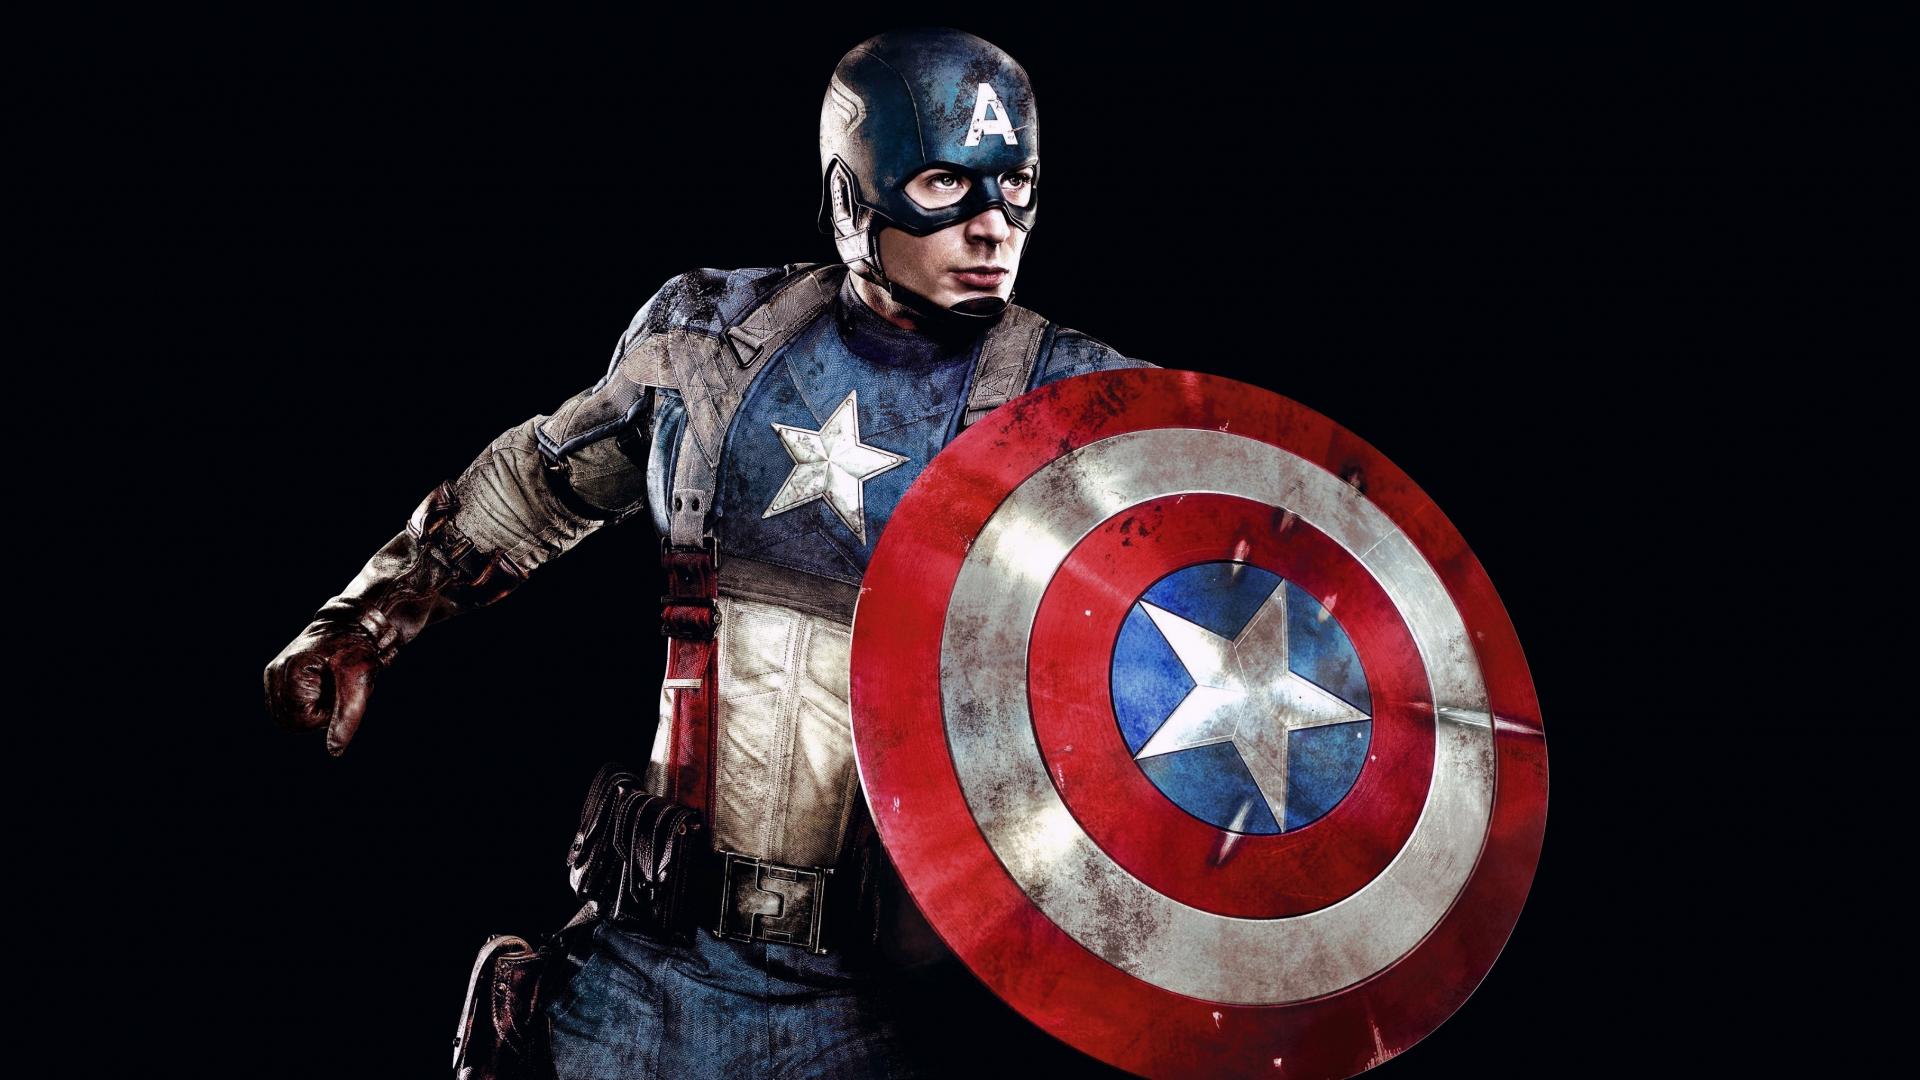 Download 1920x1080 Wallpaper Captain America Superhero Marvel